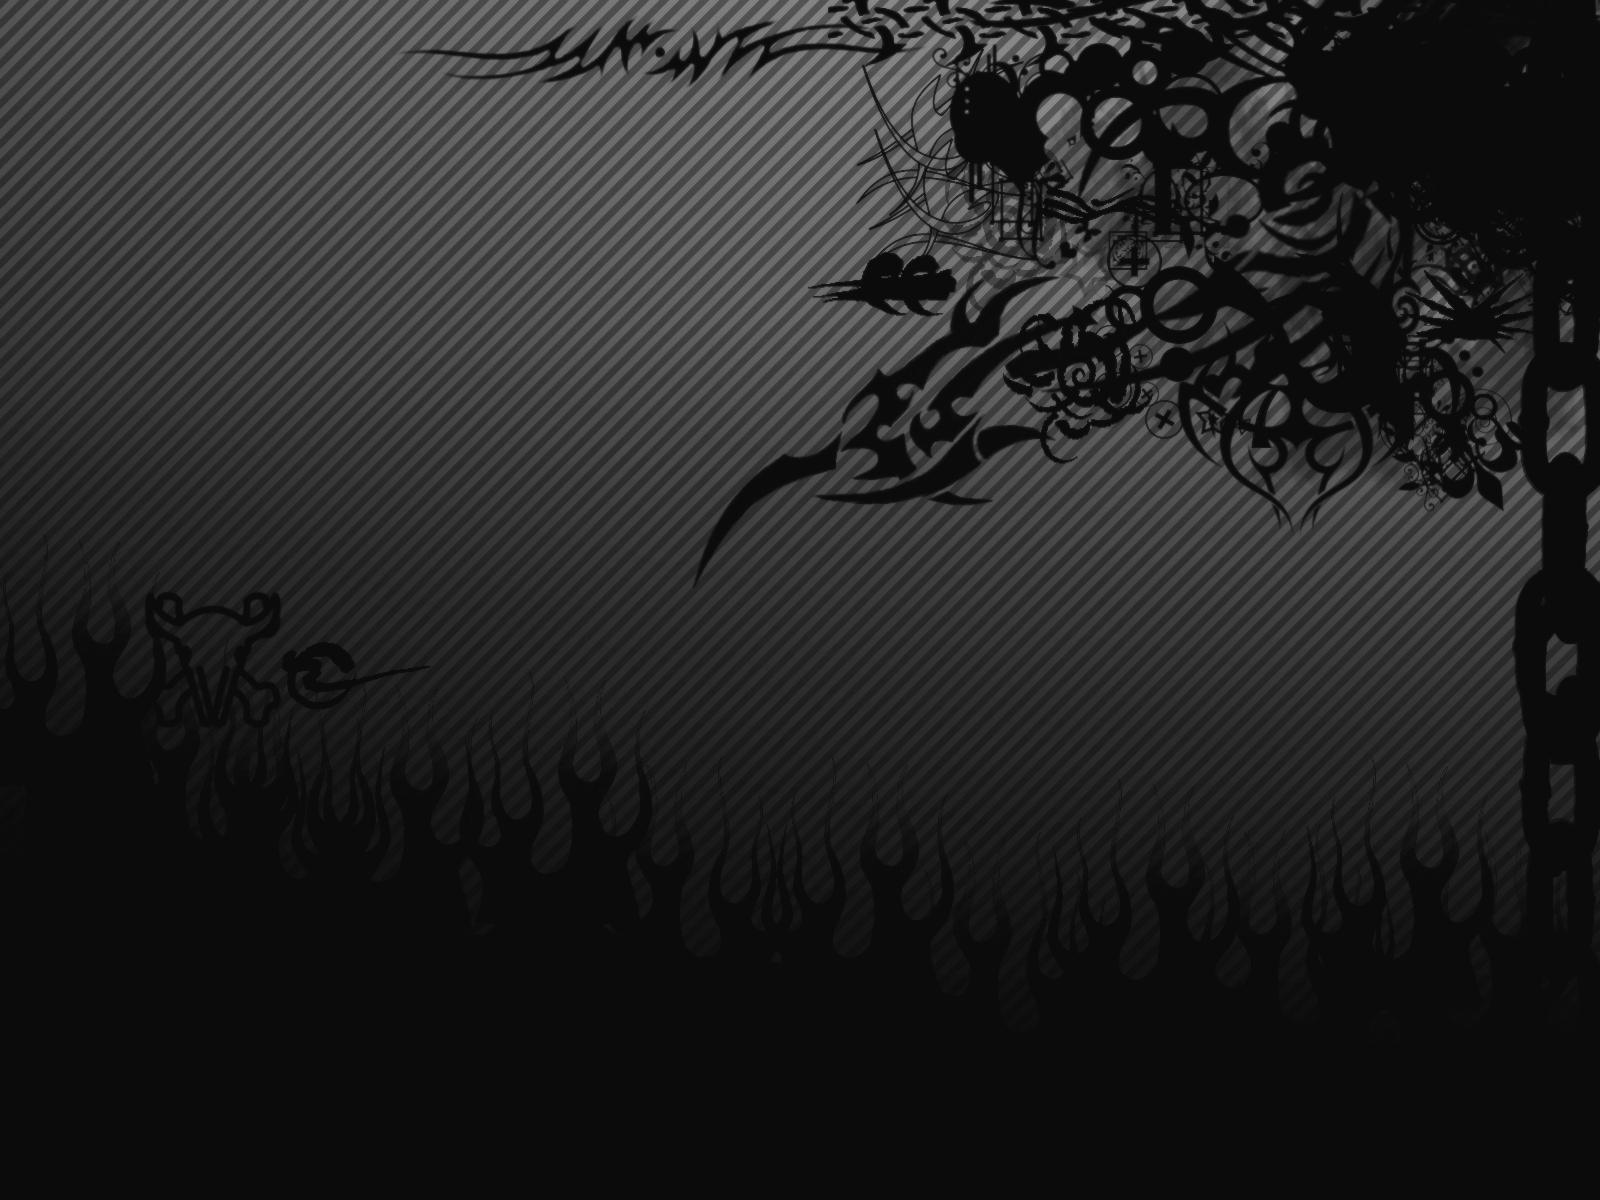 http://3.bp.blogspot.com/-JAf8YV4fvUE/UICobz11ppI/AAAAAAAABjs/u4YNp1yZ2Xg/s1600/black+wallpaper+(5).jpg